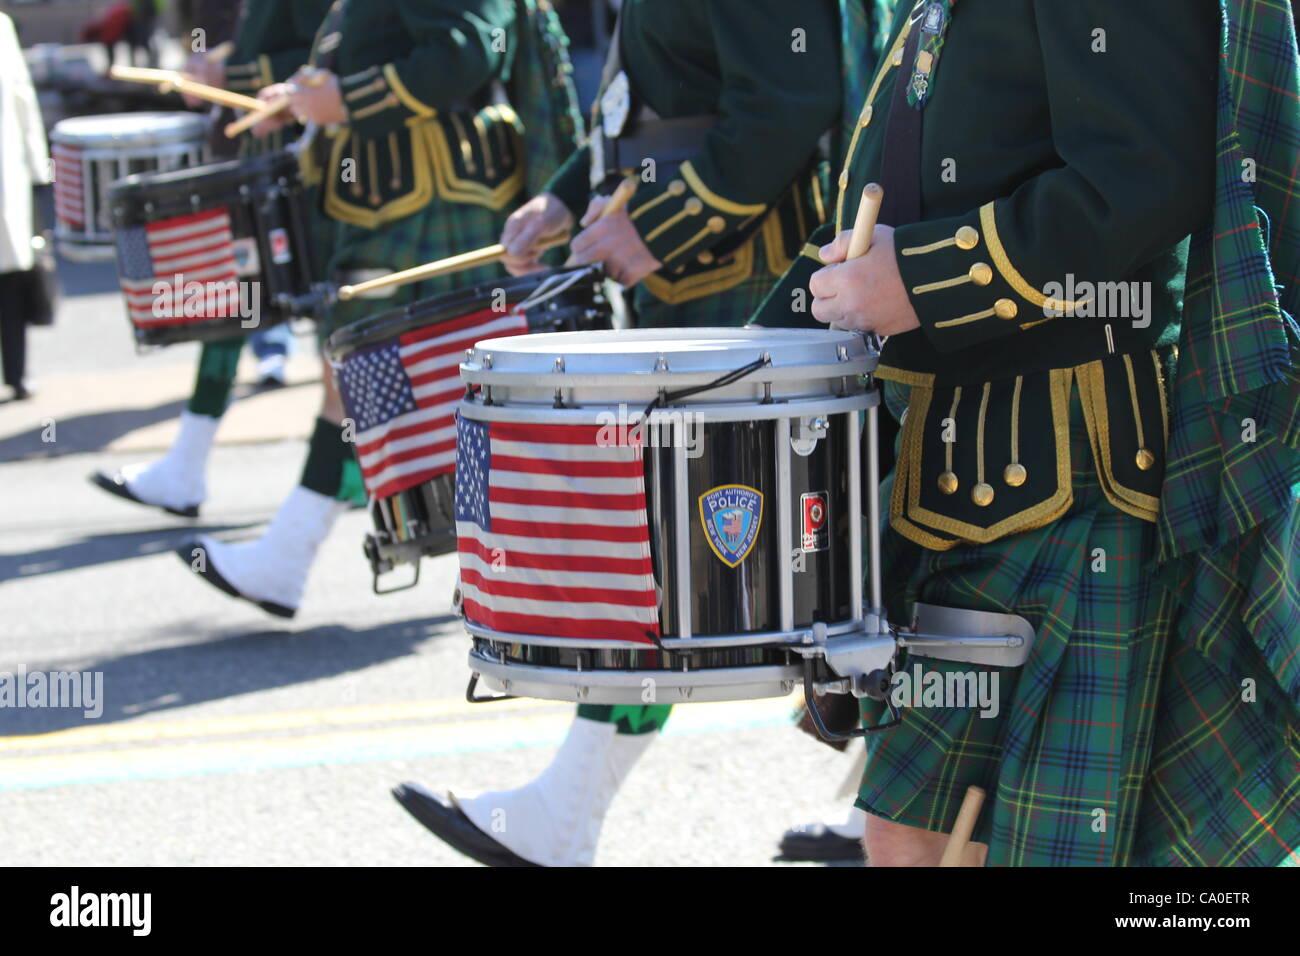 St.Patrick's Day 2012 West Orange, New Jersey U.S.A. March 11th, 2012 Stock Photo